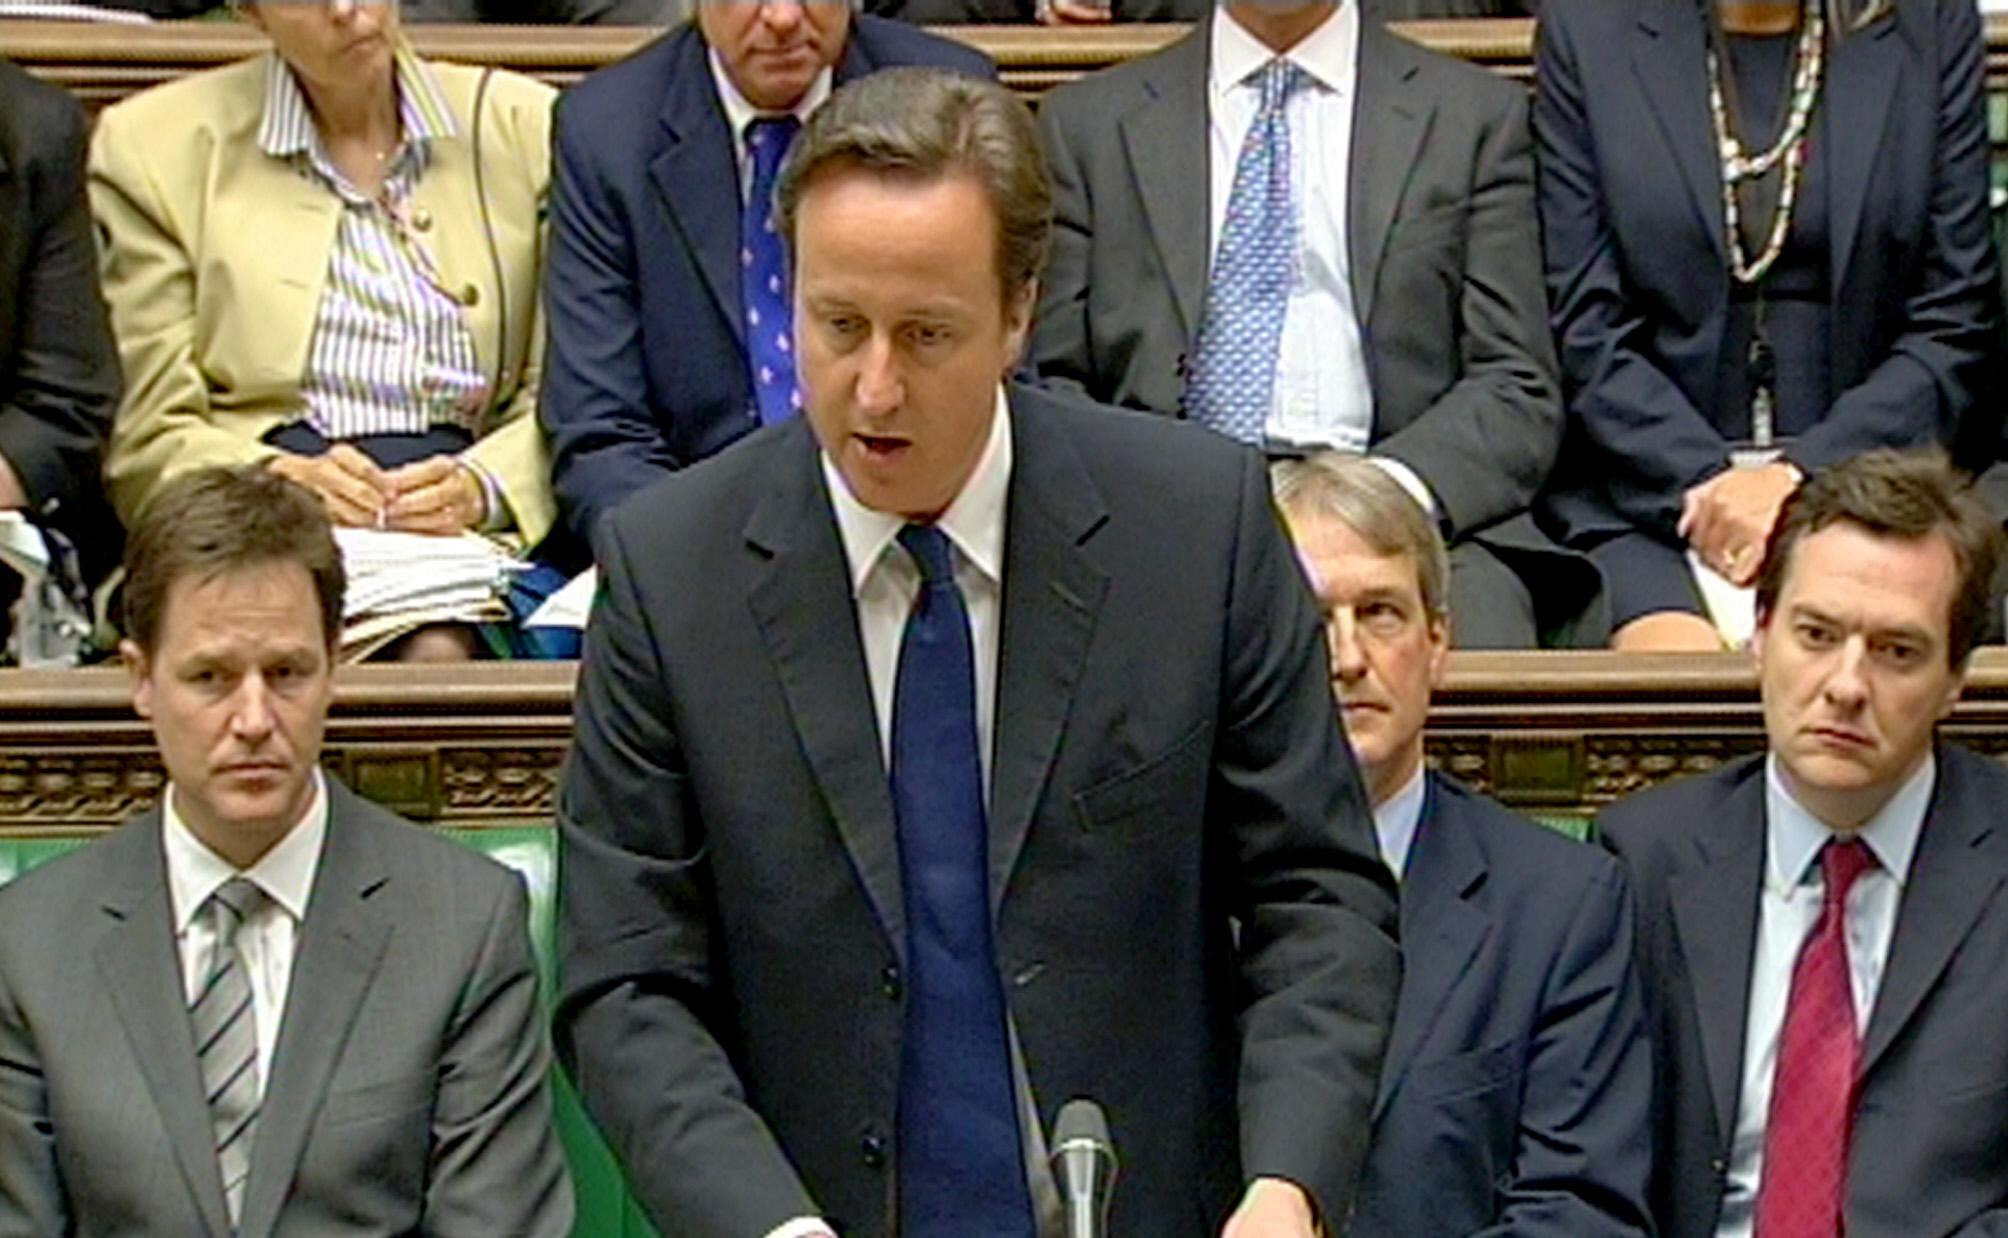 Cameron Bloody Sunday